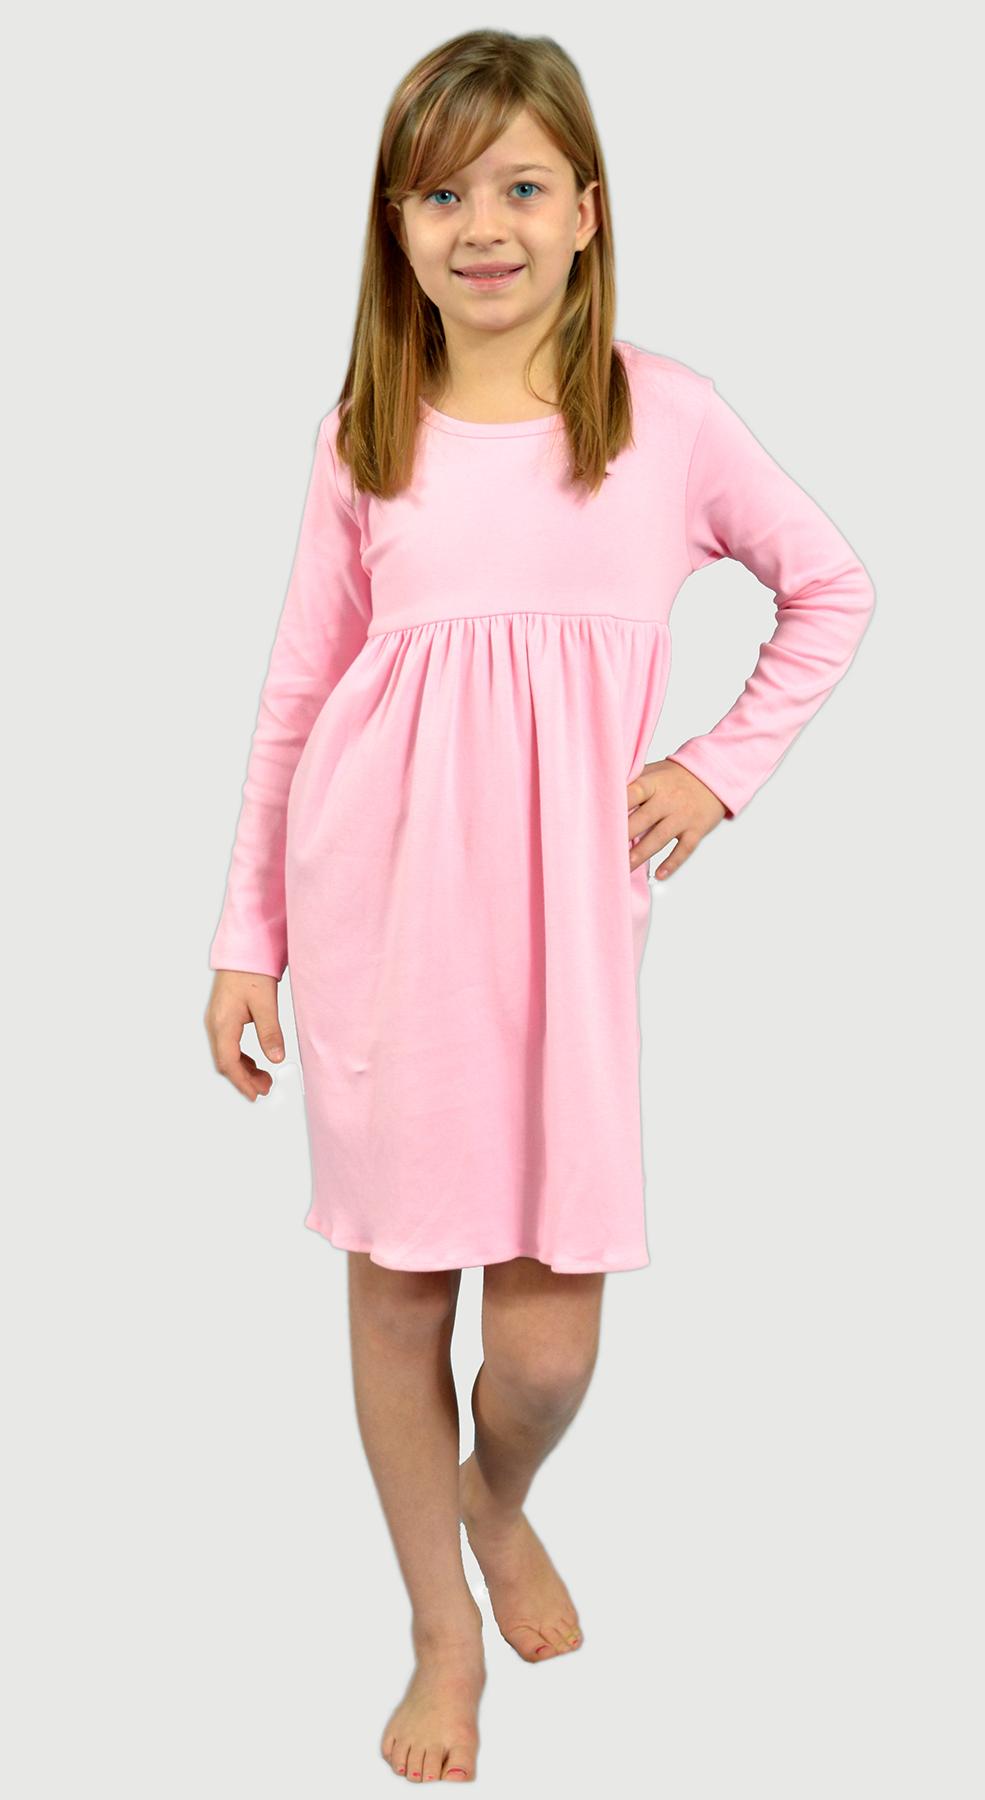 Monag 400112 - Interlock Long Sleeve Empire Dress